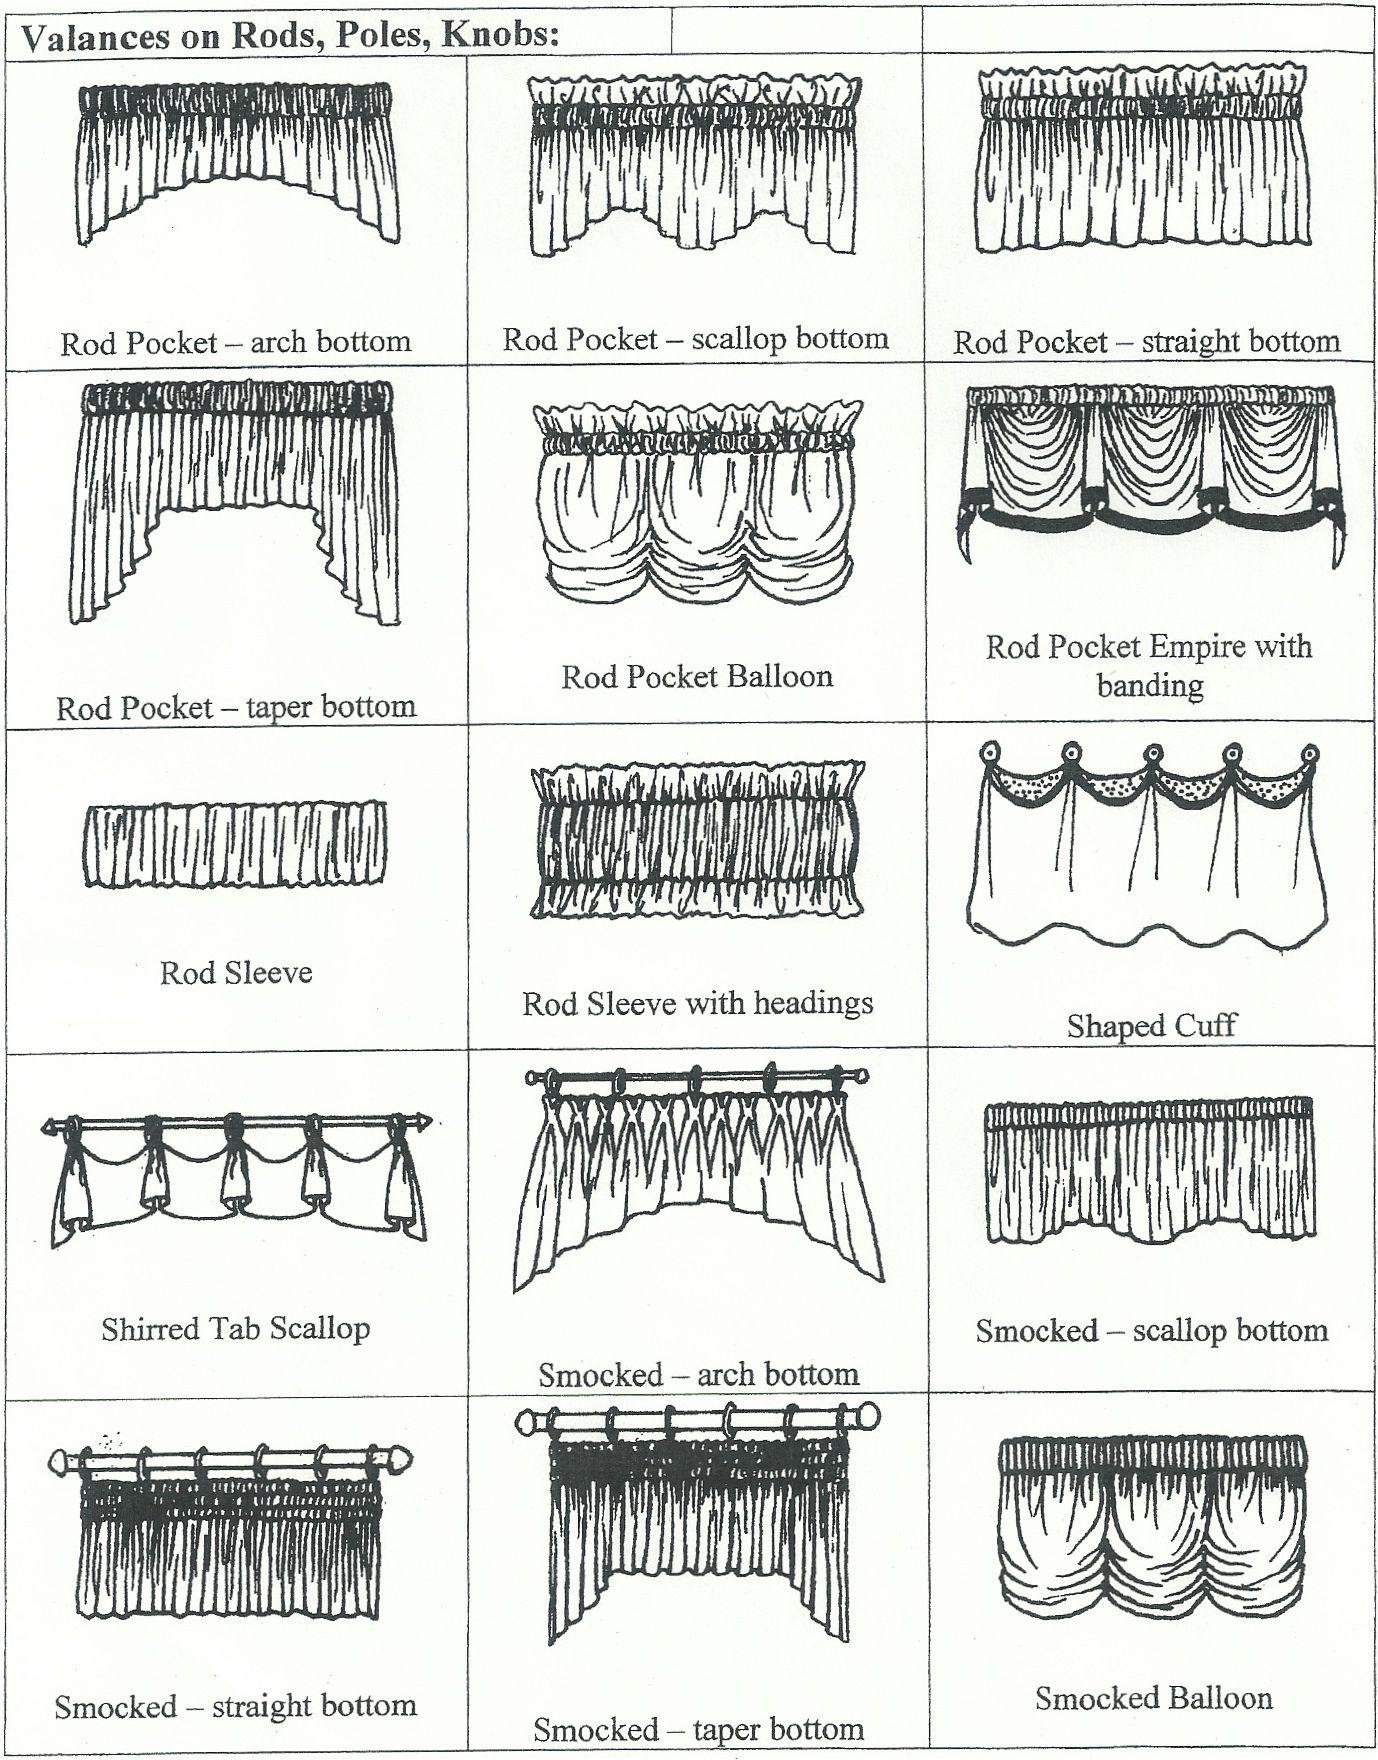 Valence Styles